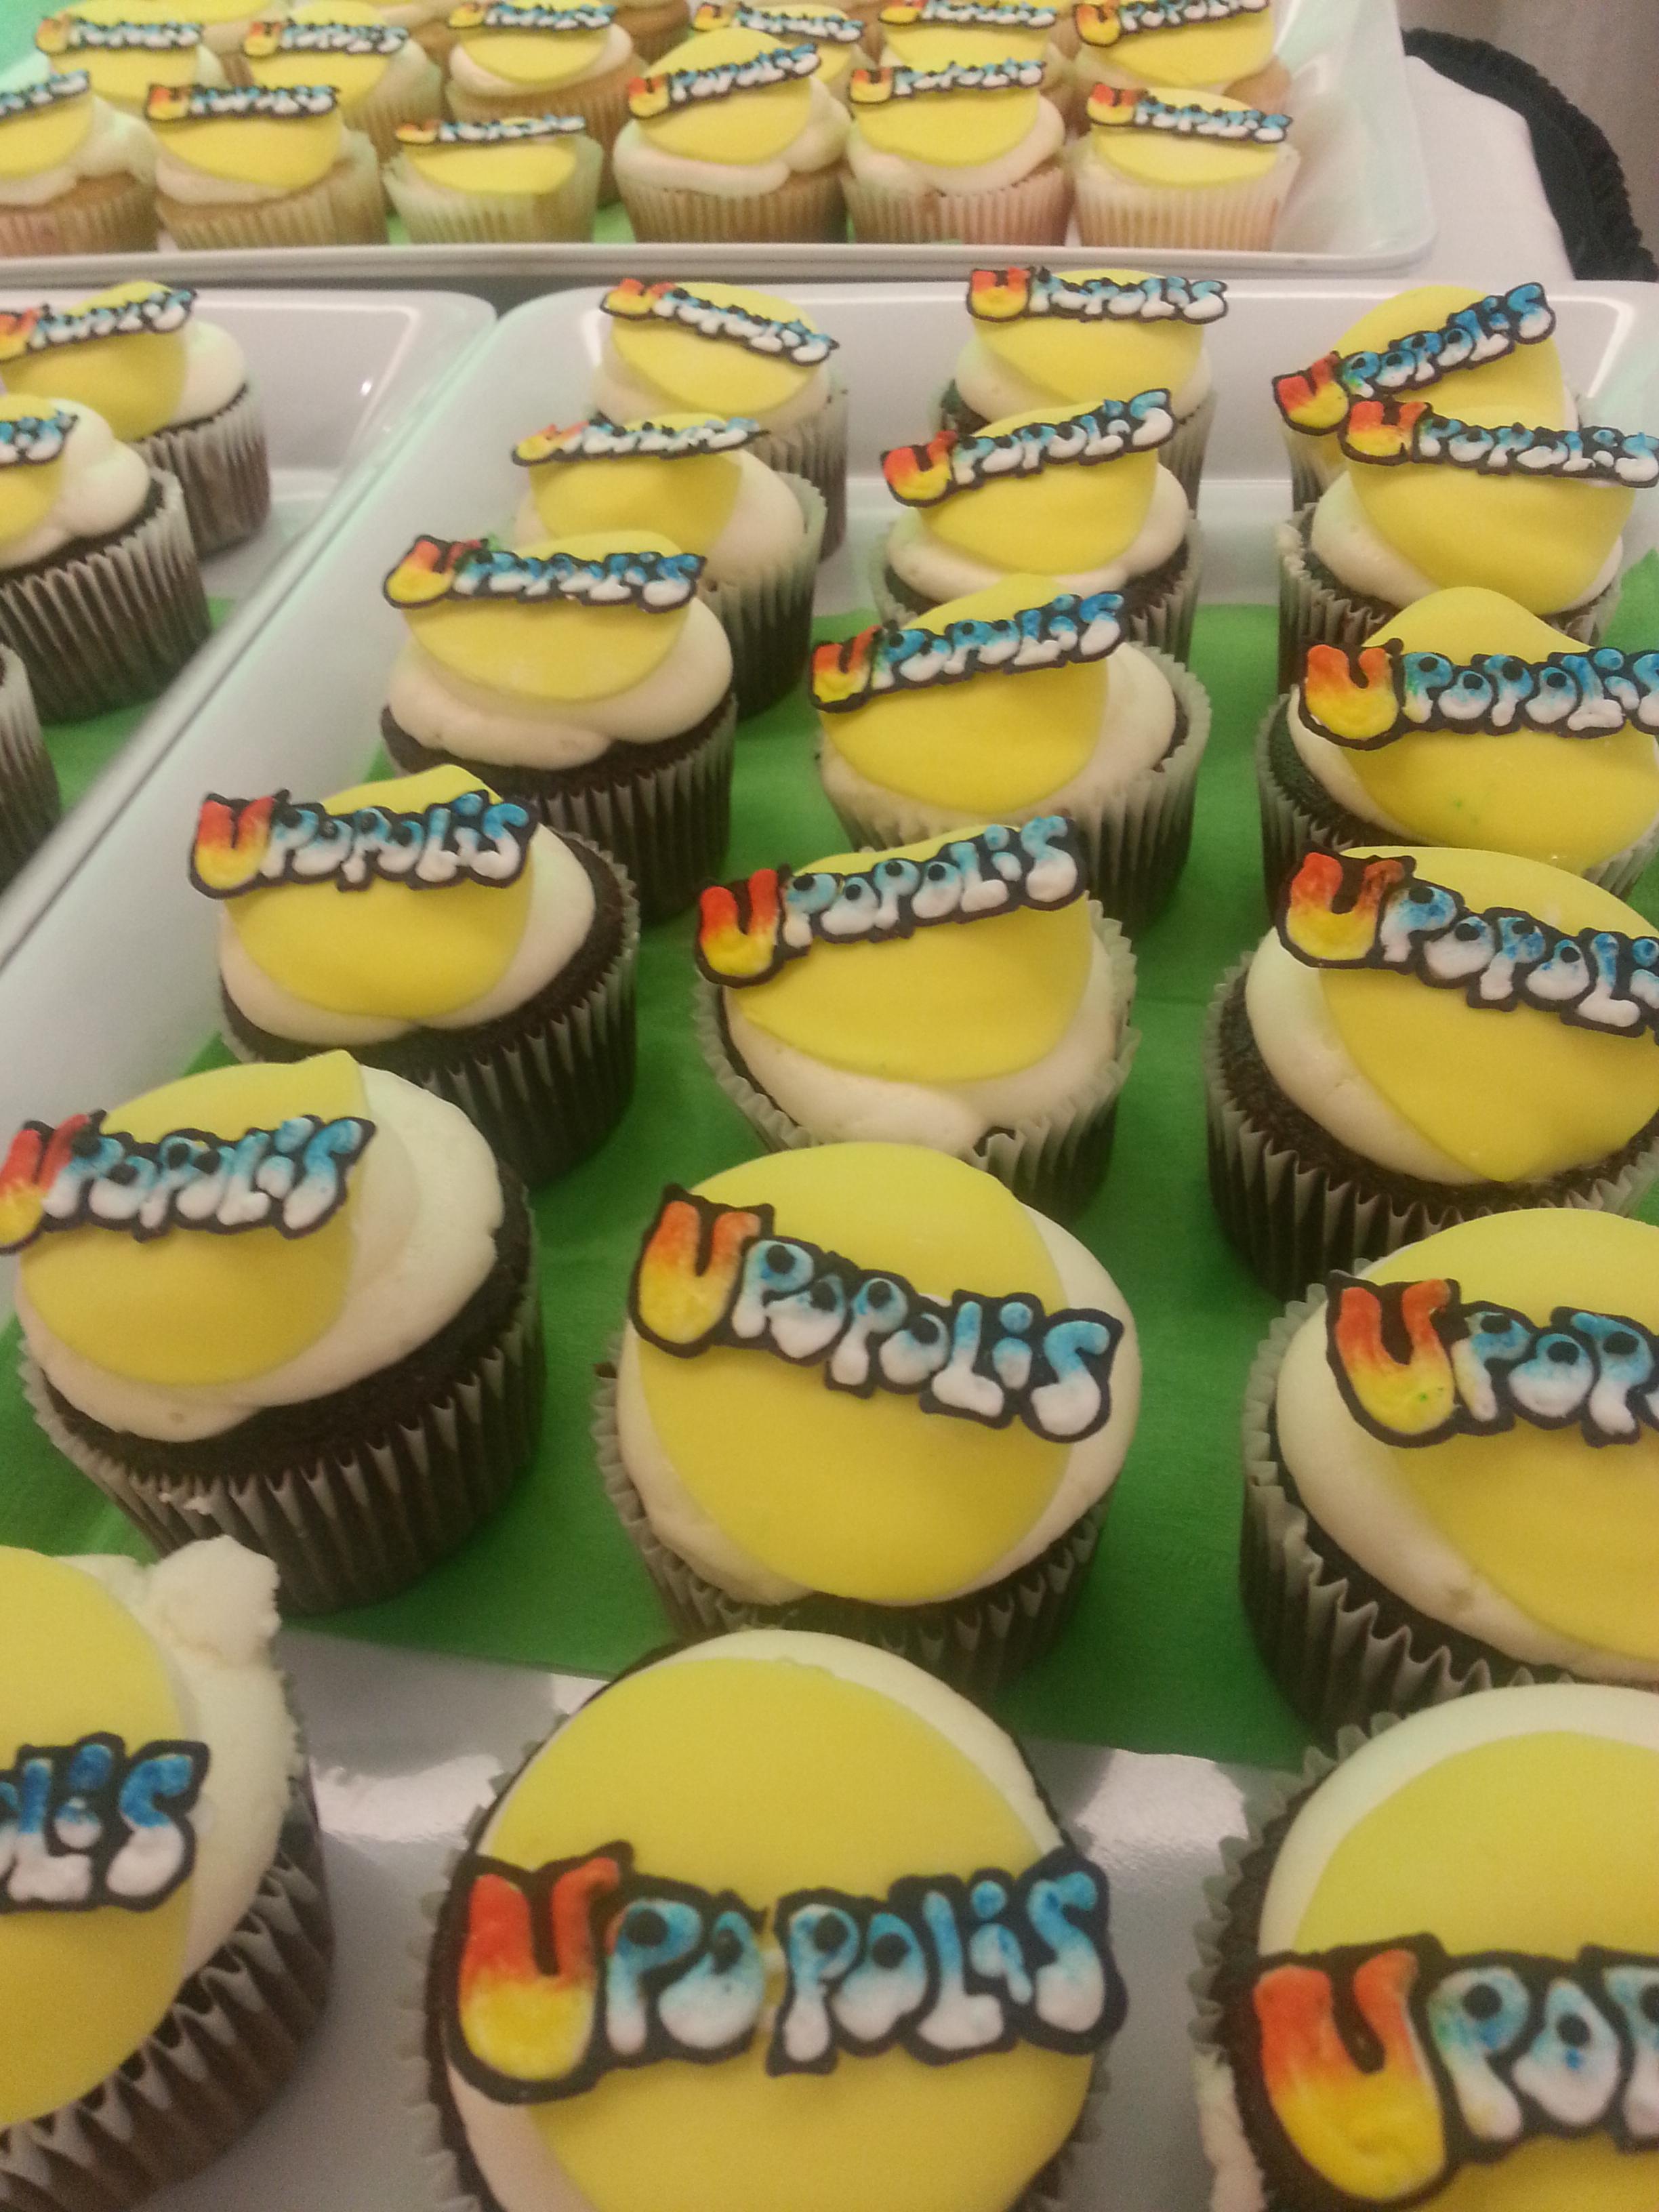 Celebratory Cupcakes!